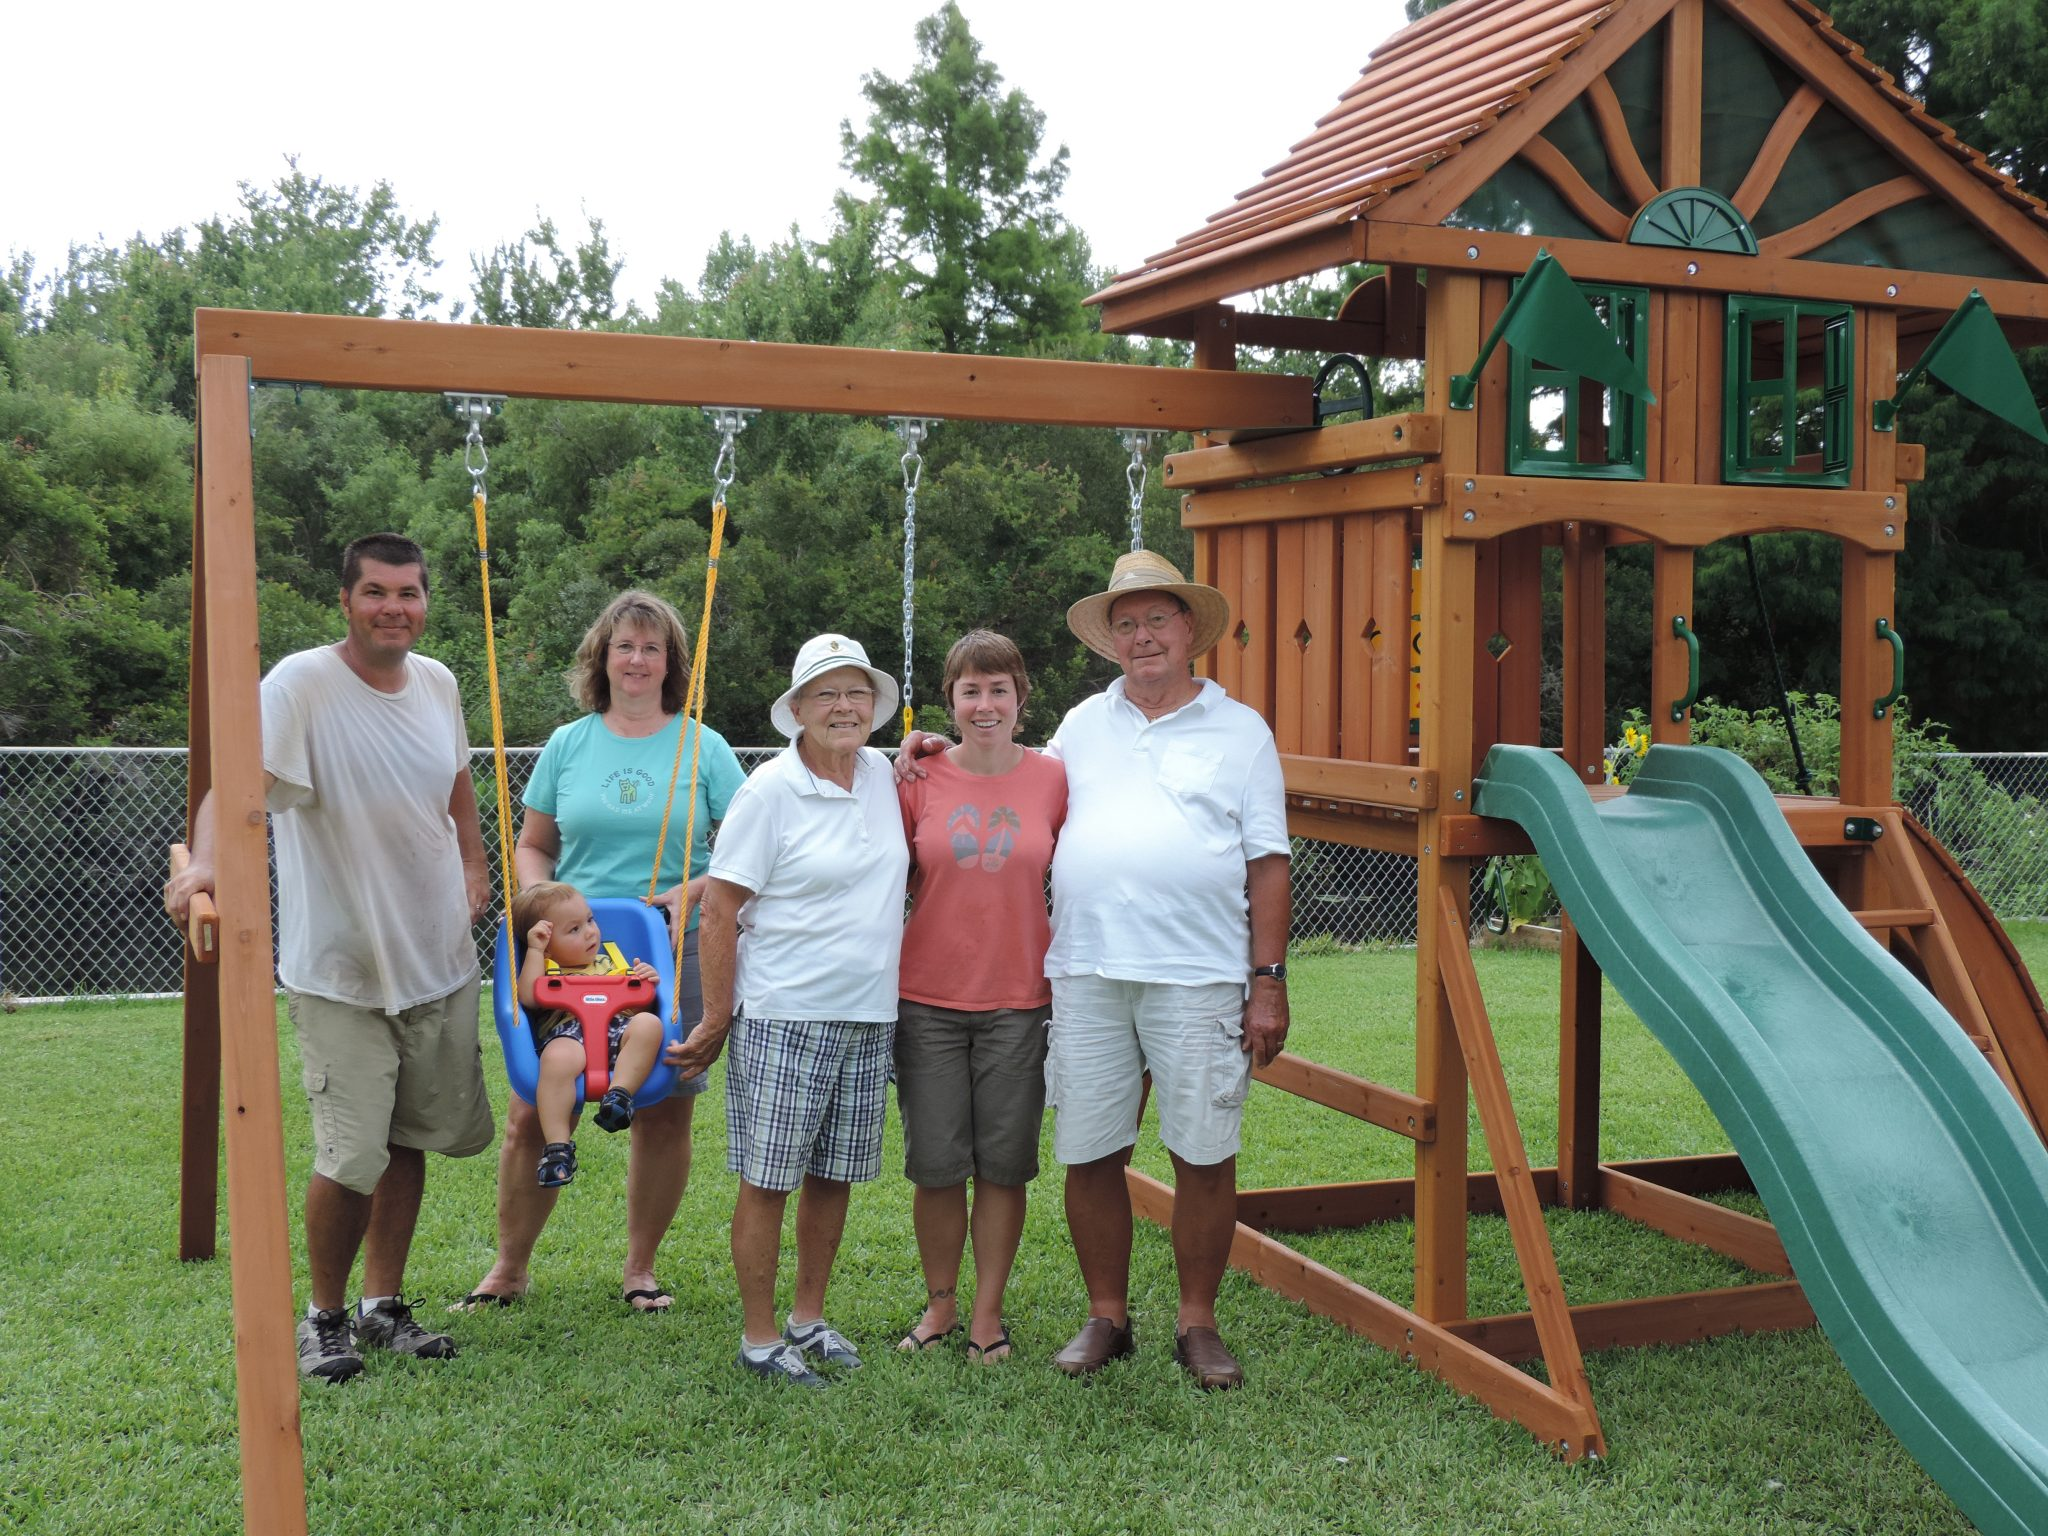 Grandma, along with her husband Chuck, daughter Linda, granddaughter Kelly, her husband John and great-grandson Lucas.